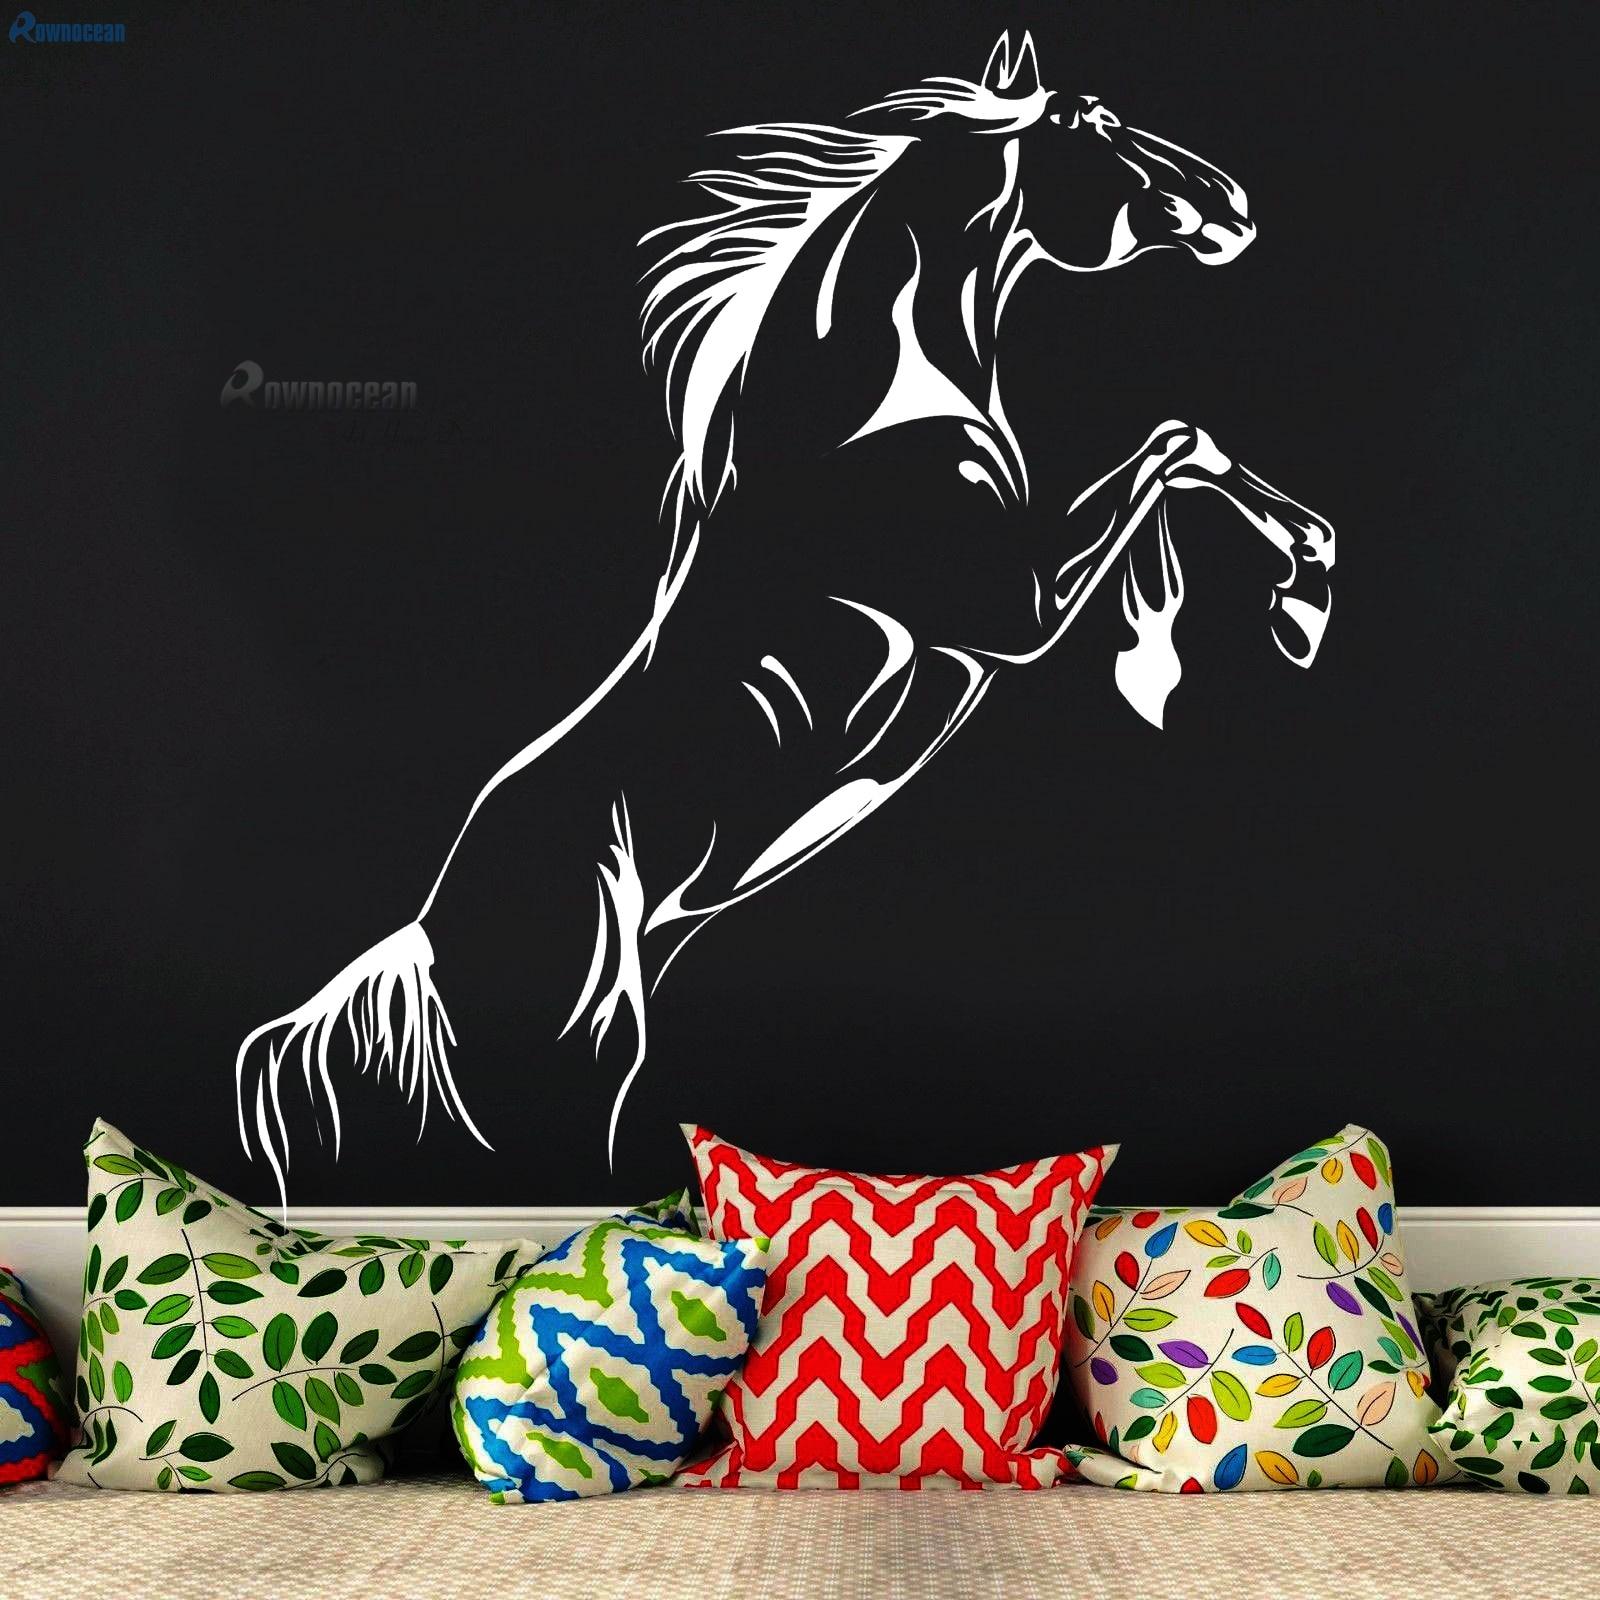 Horse sticker wall art - Creative Animals Running Horse Interior Wall Stickers For Kids Rooms Art Home Decor Living Room Vinyl